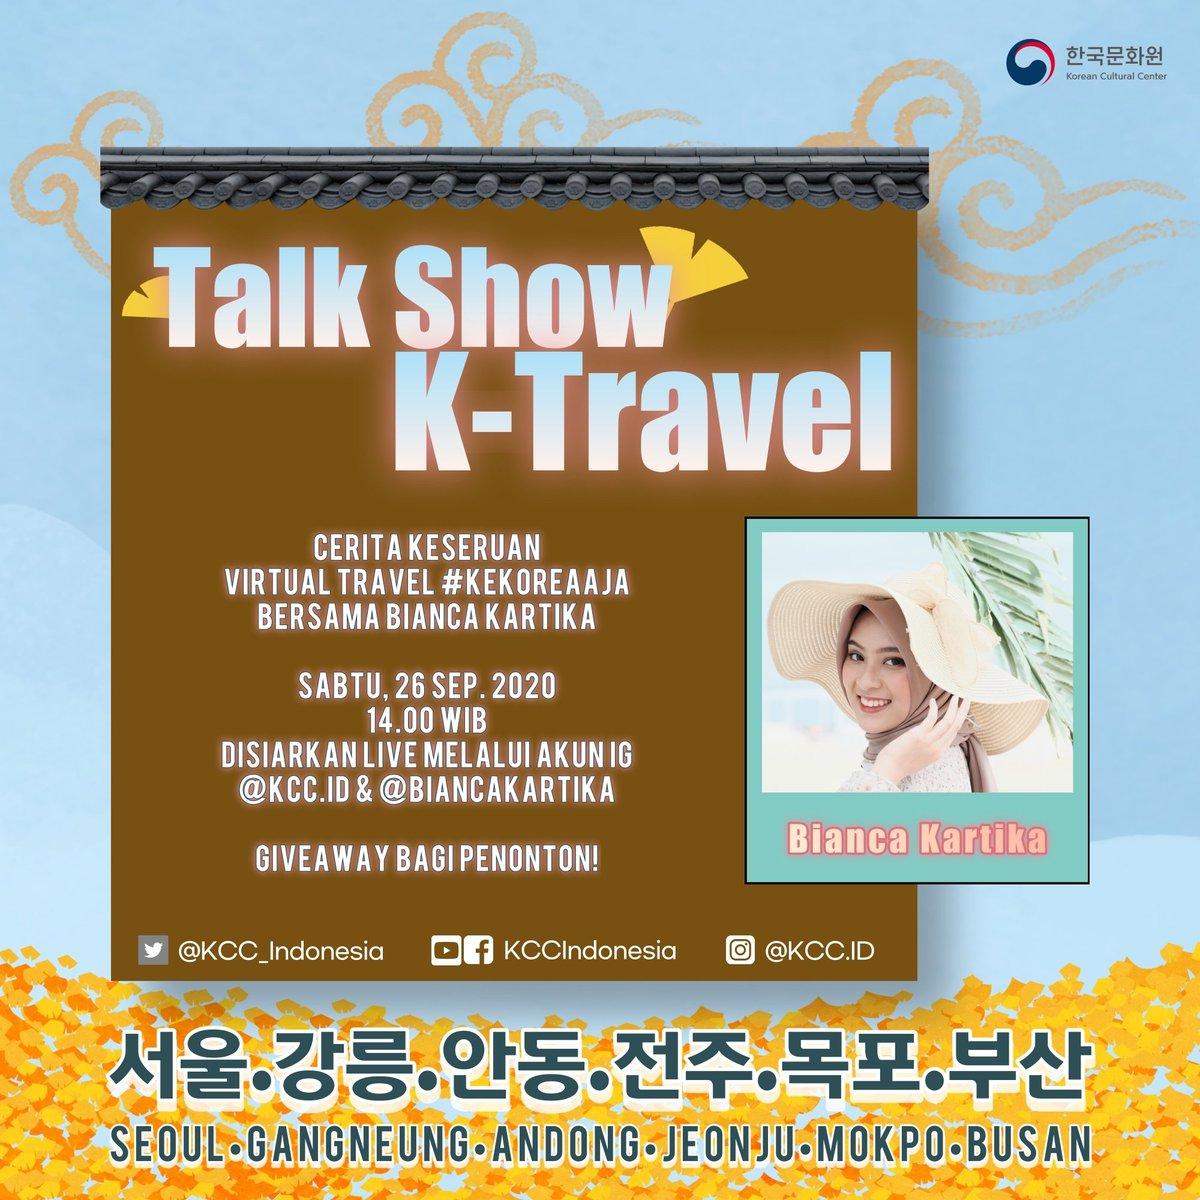 Nonton, yaa~ Sampai ketemu di acara daring KCCI! 감사합나다.  #KTravel #KCCIndonesia #KTravelKCCI #JalanjalankeKorea #virtualtravel #Korea #Seoul #Gangneung #Andong #Jeonju #Mokpo #Busan https://t.co/gE1sefYZwk